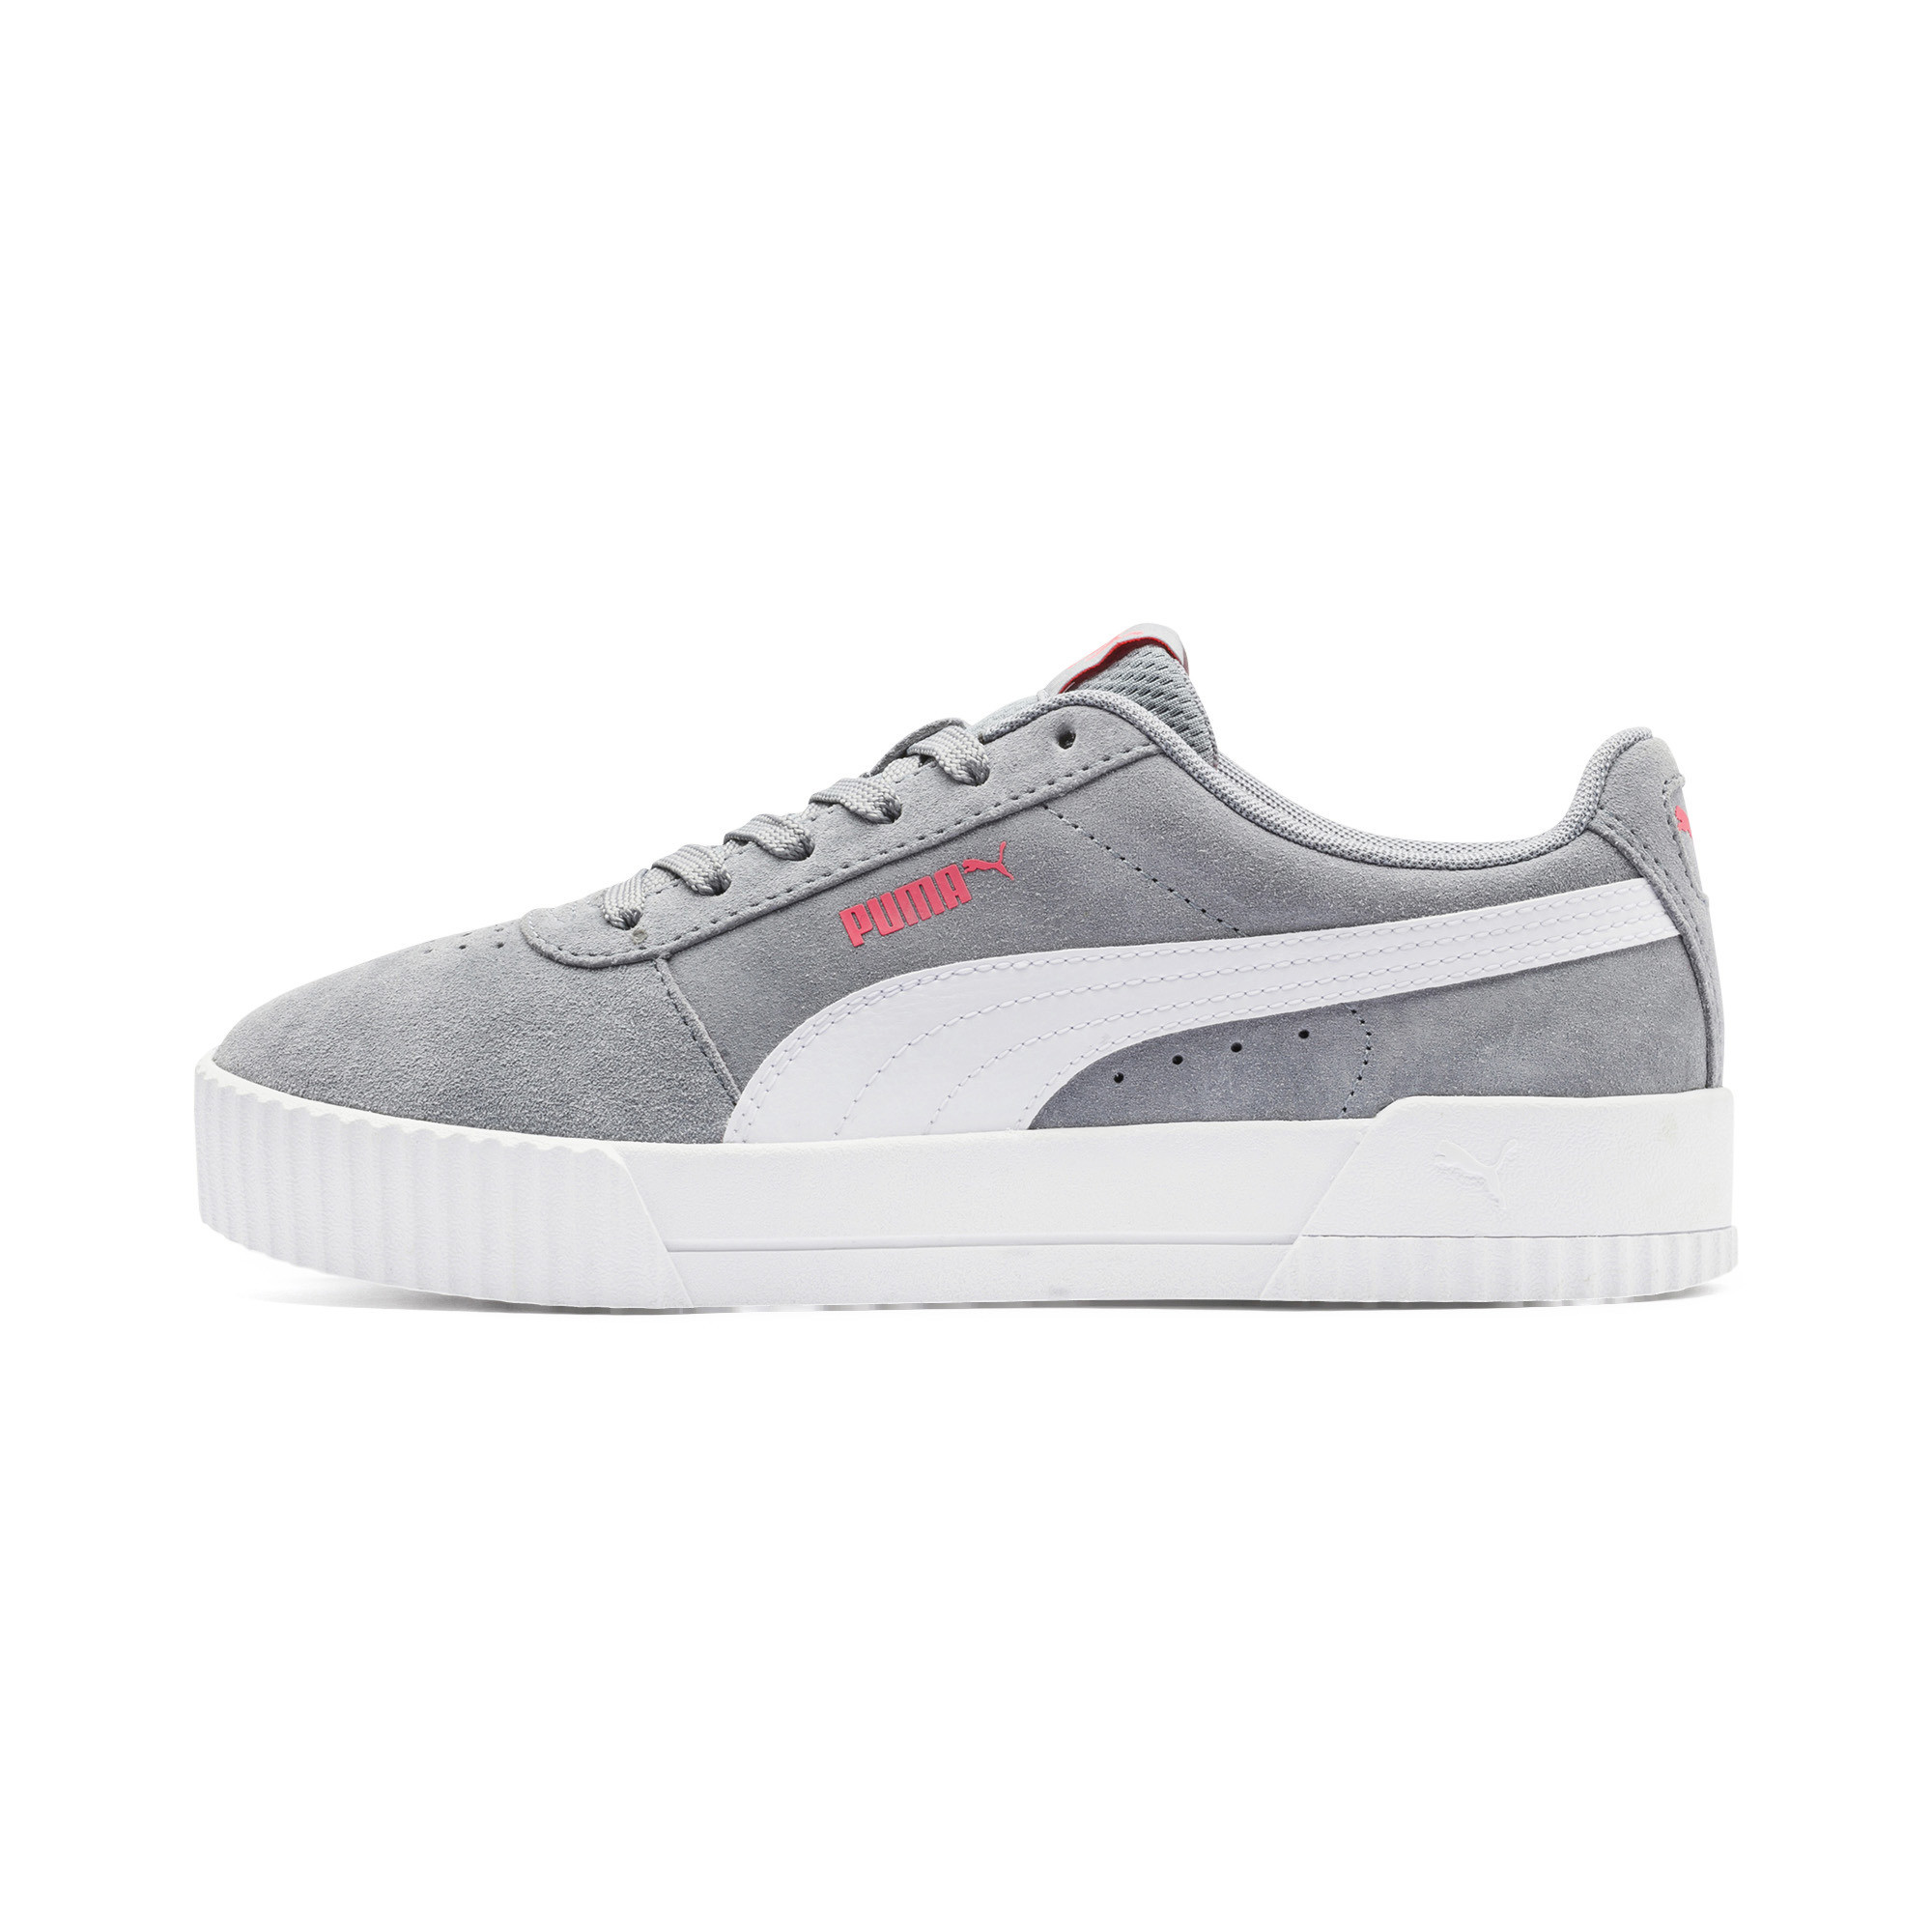 PUMA-Carina-Women-s-Sneakers-Women-Shoe-Basics thumbnail 4